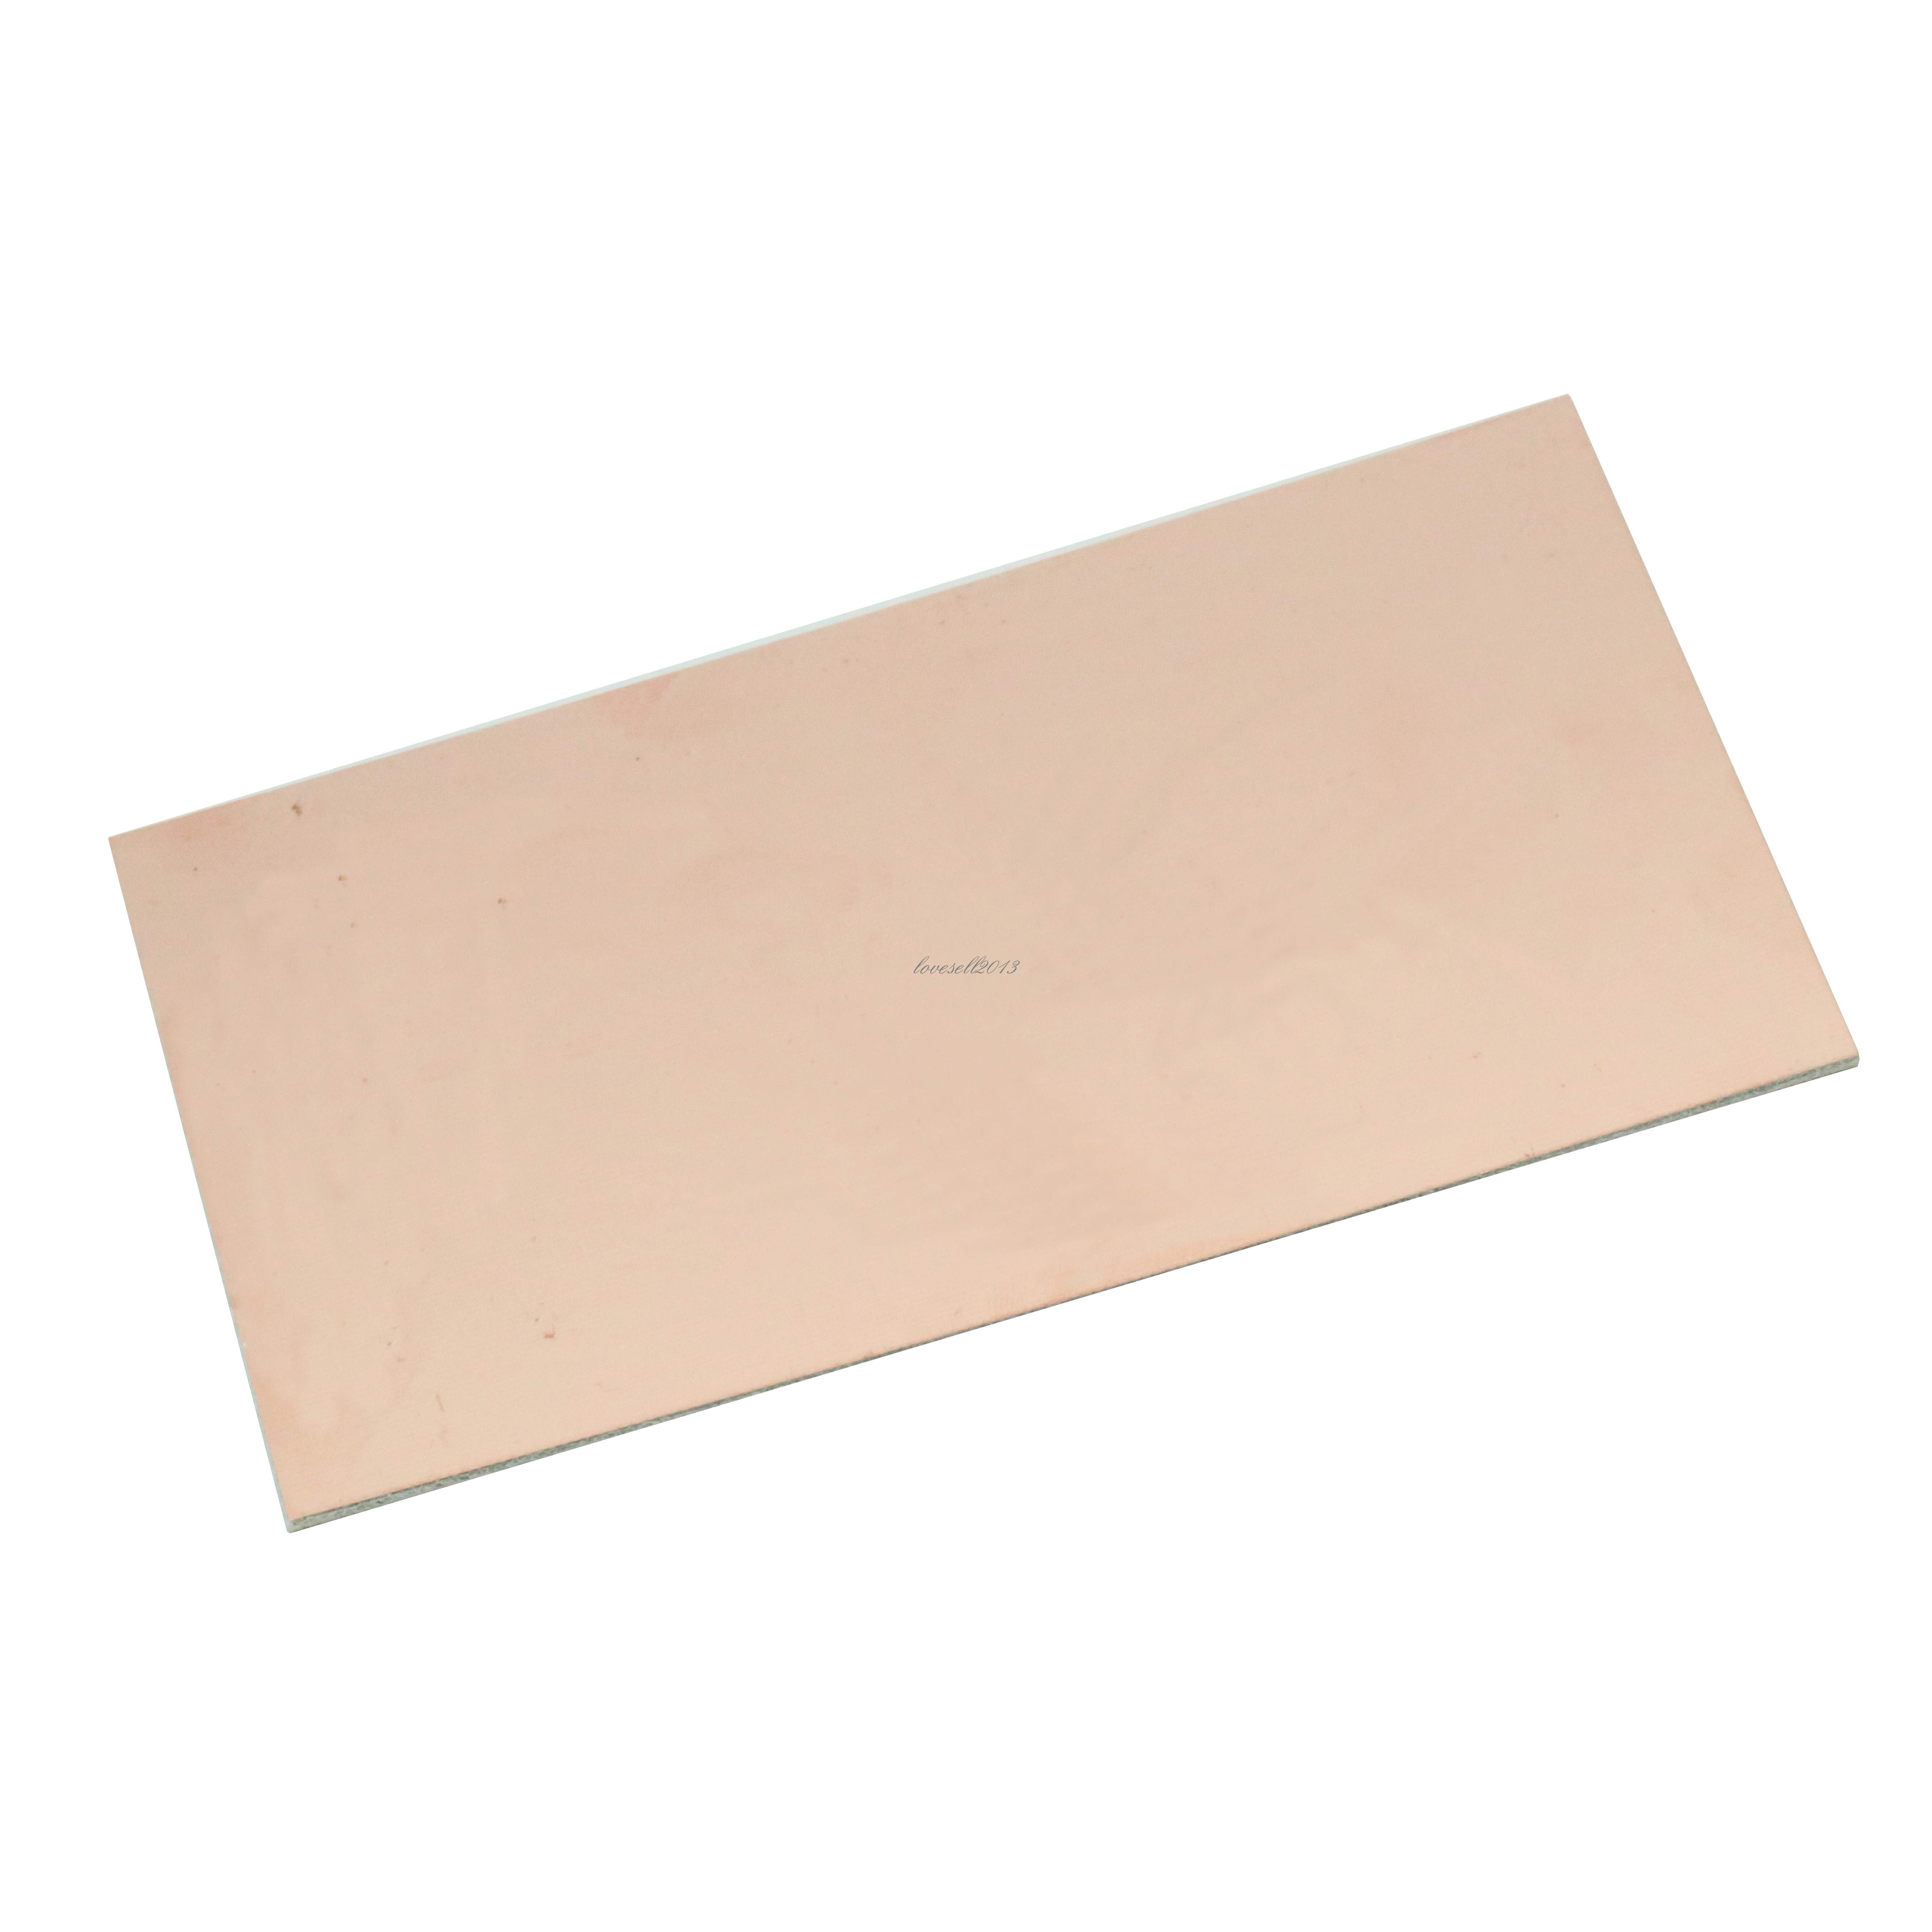 1//2//5//10PCS 10*15cm 10cmx15cm Single PCB Copper Clad Laminate Board FR4